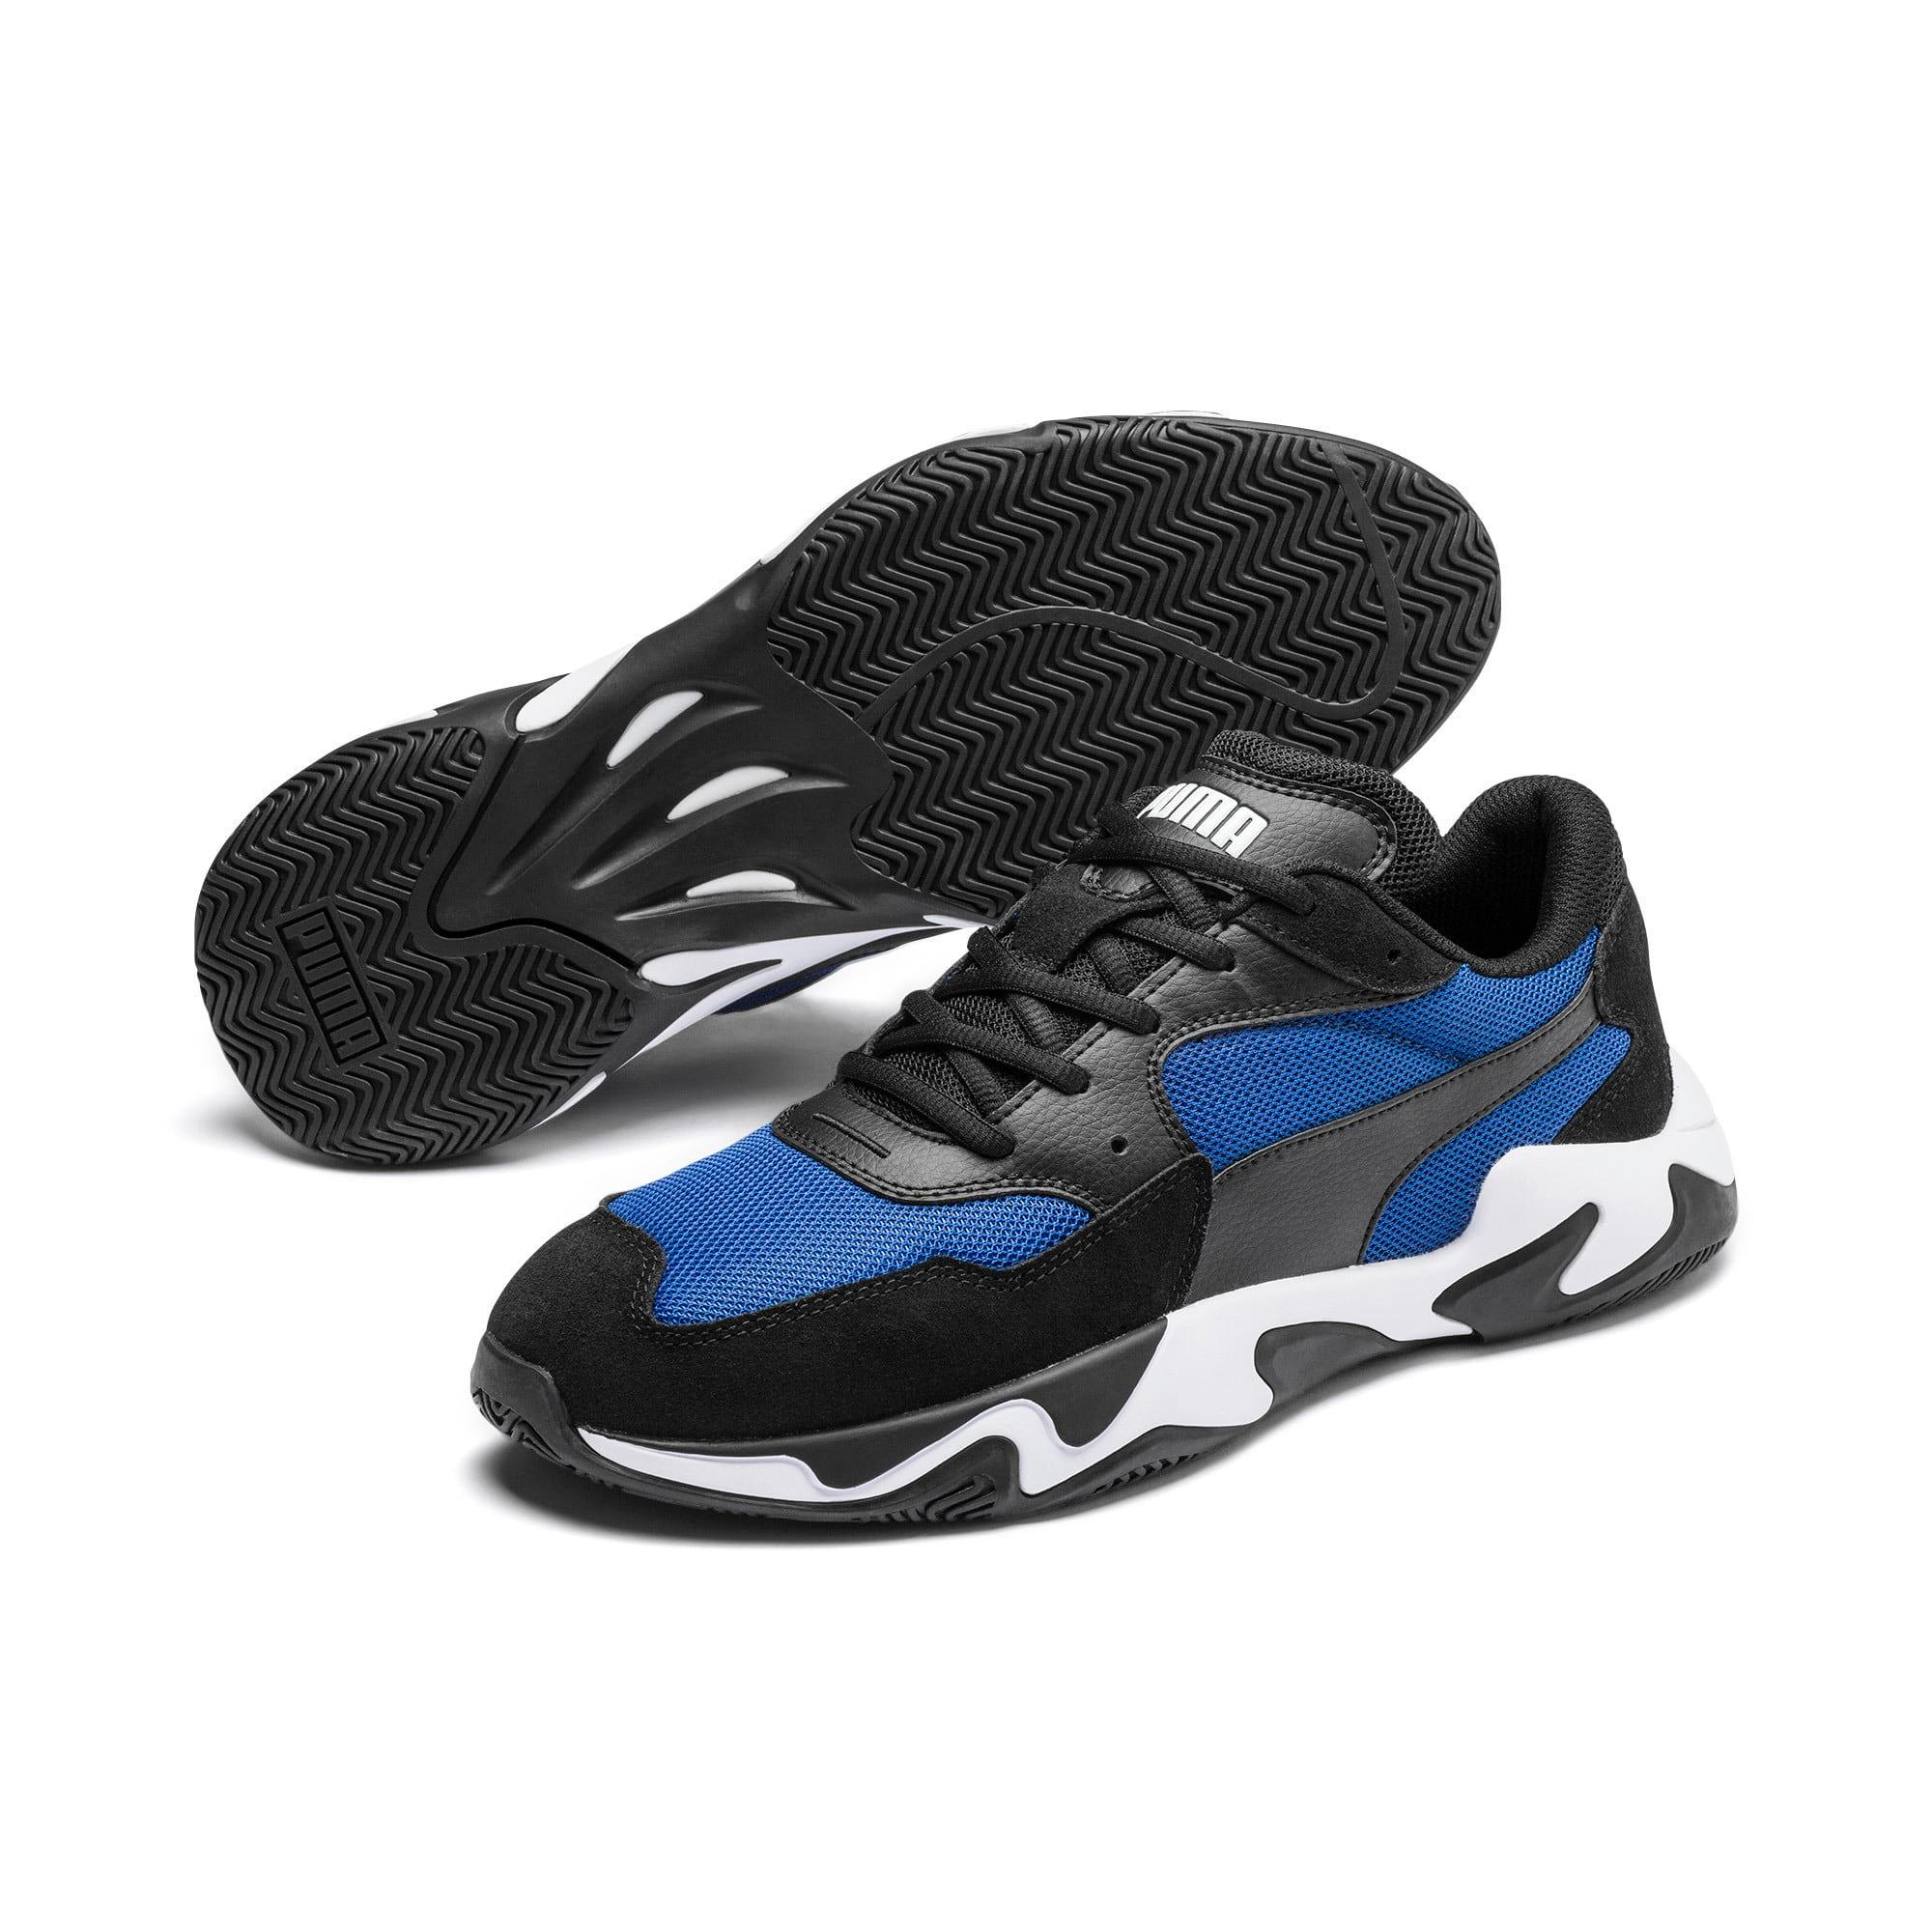 Thumbnail 3 of Storm Adrenaline Sneakers, Puma Black-Galaxy Blue, medium